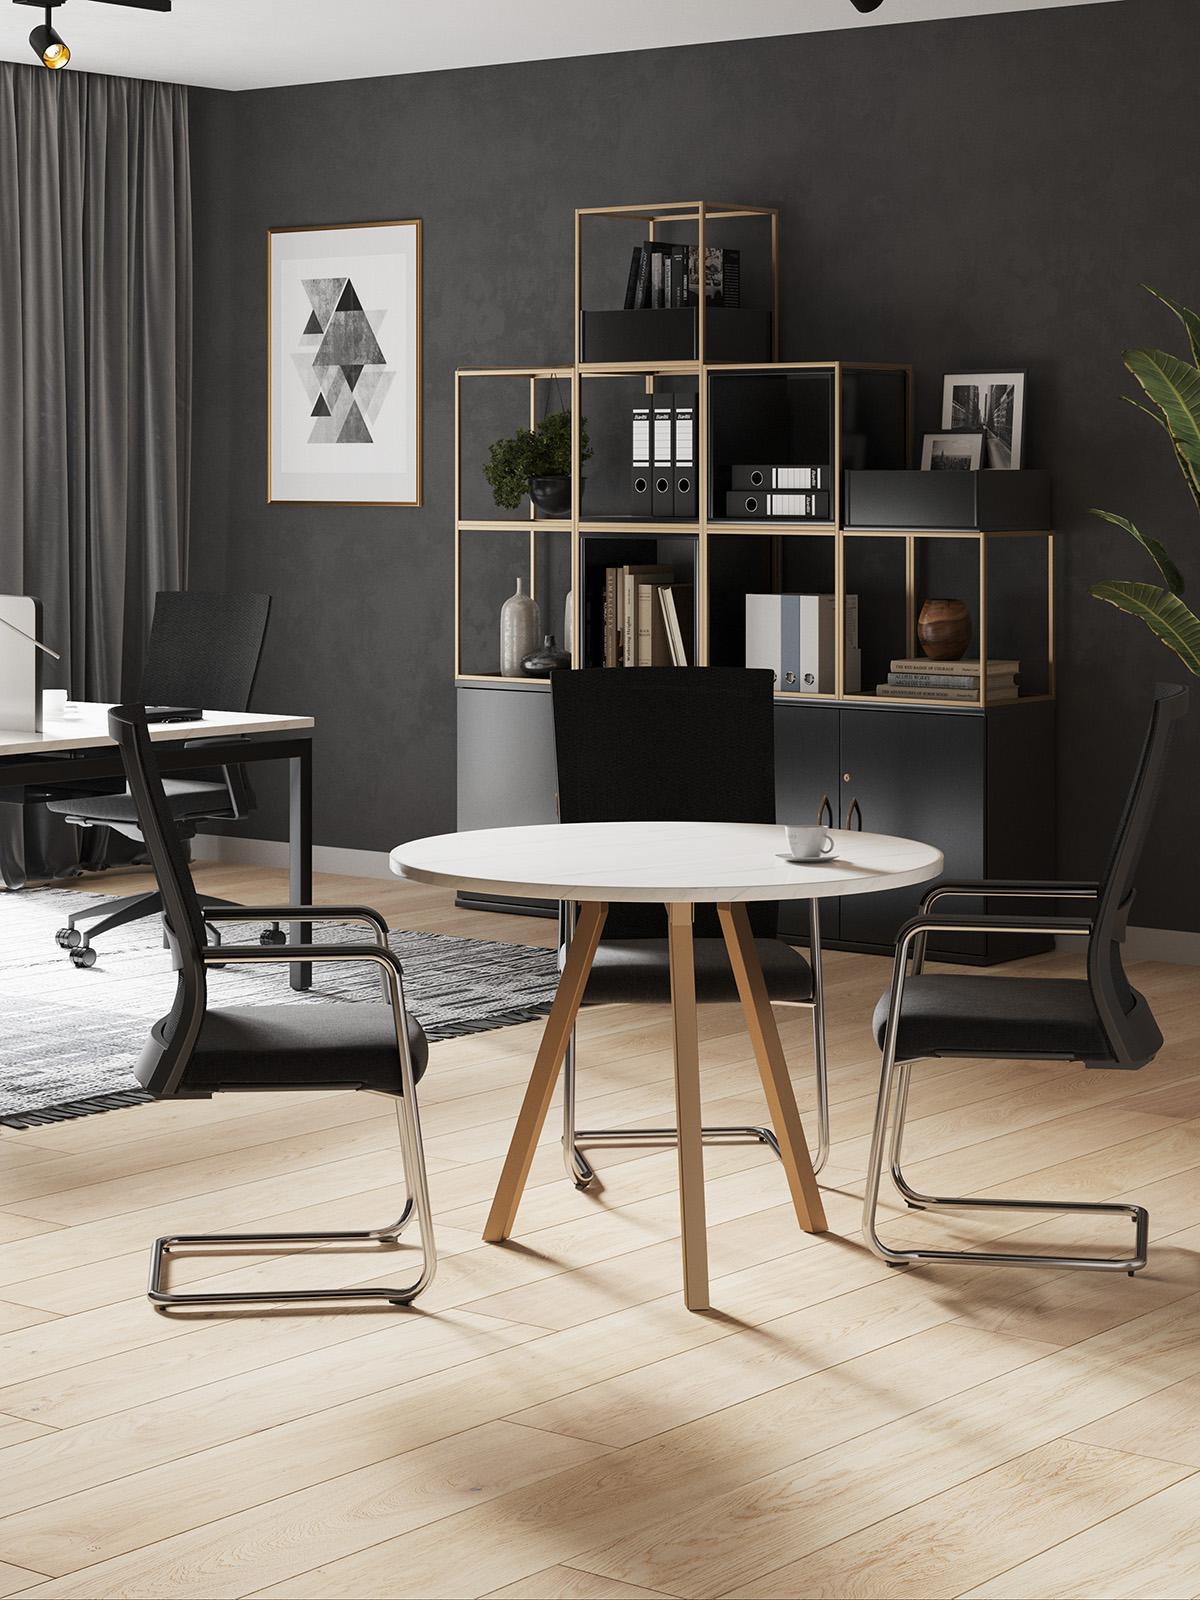 Grid Cube Storage Metal Modern Office Furniture Gold Bronze Marble Desk Circular Table Round